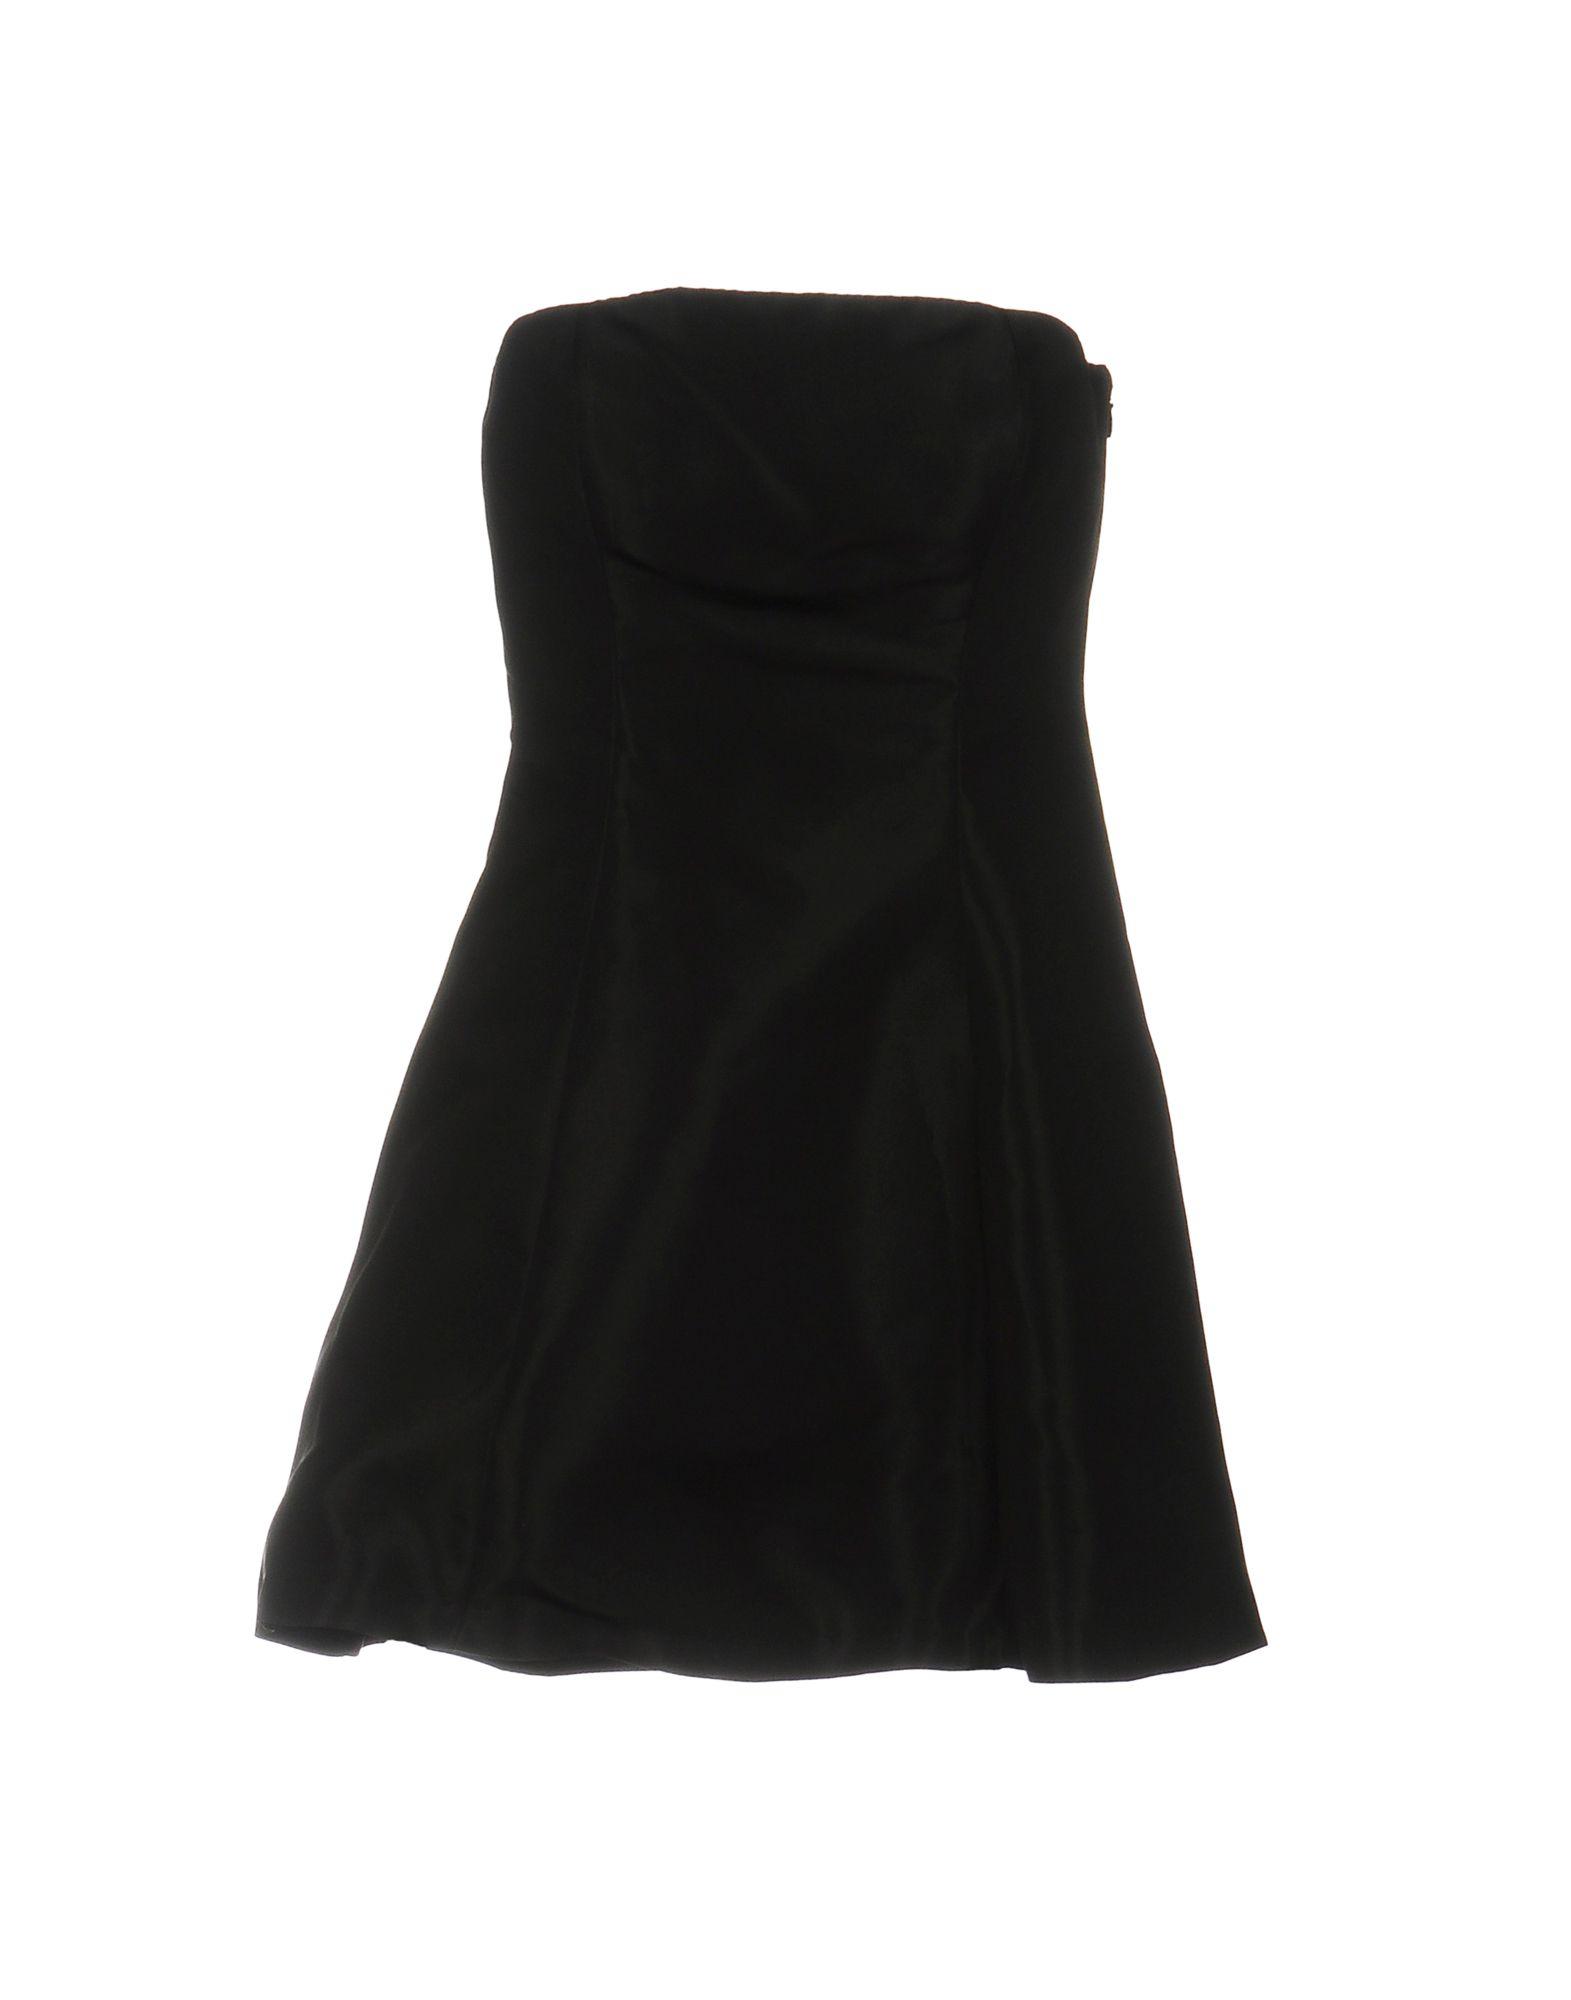 RALPH LAUREN BLACK LABEL Короткое платье ralph lauren black label короткое платье